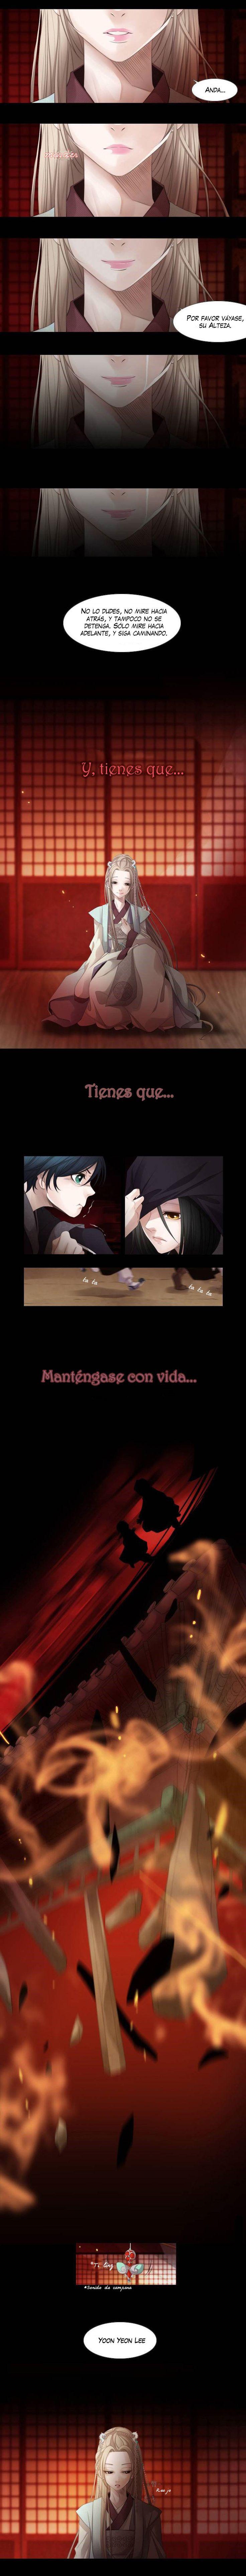 Twelve Nights 00 MANGA Online Español - EsManga.com